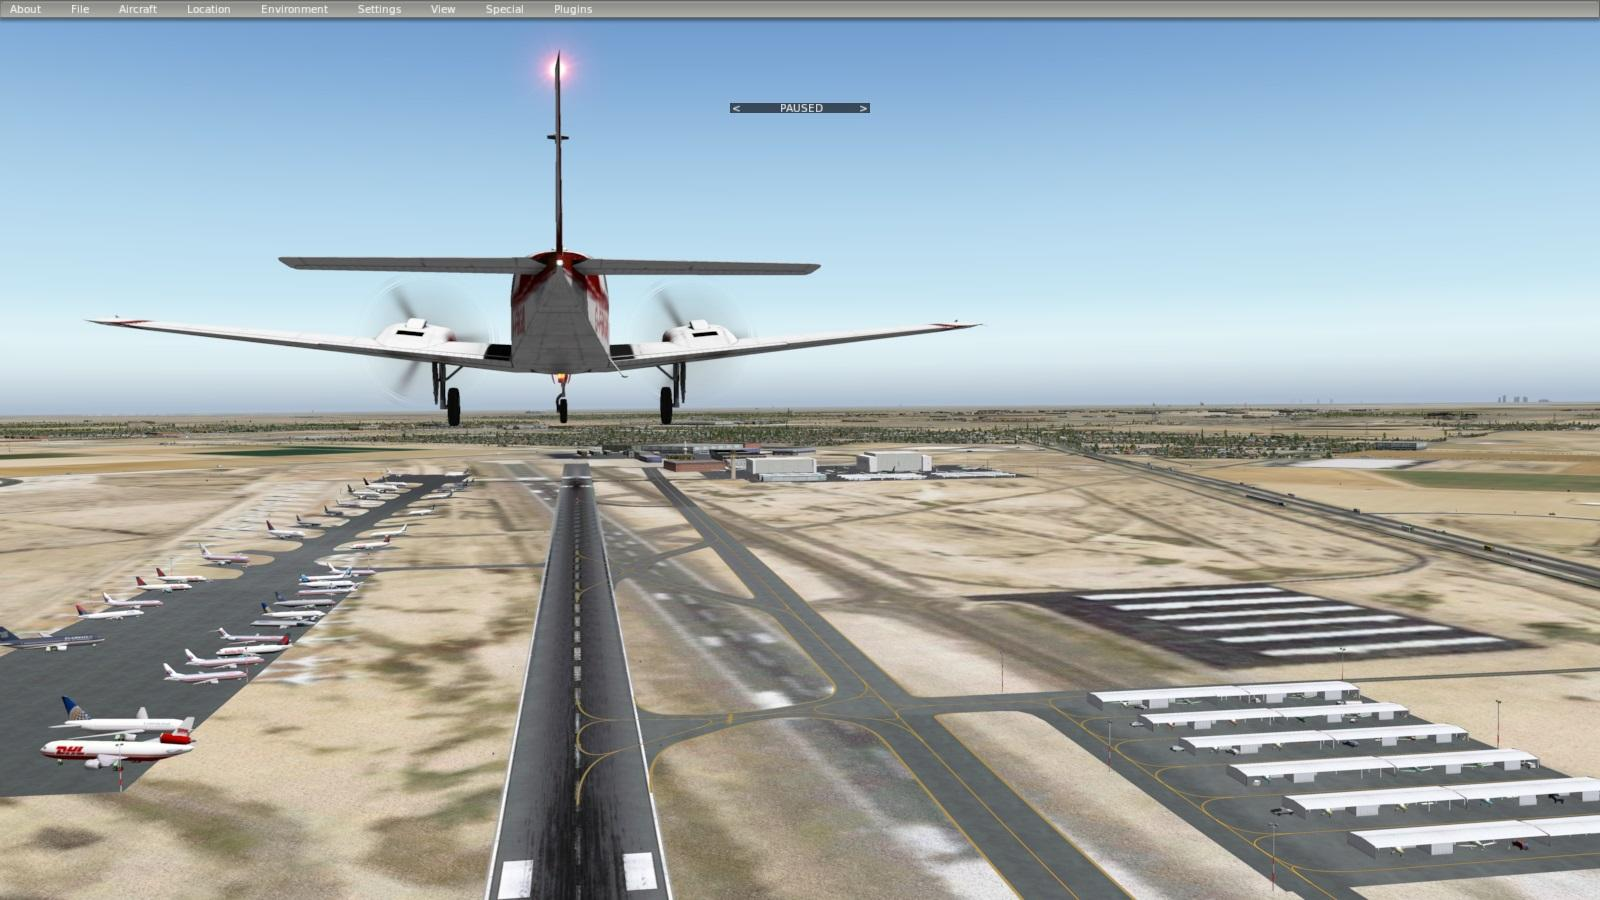 KGYR - Phoenix Goodyear Airport, Arizona USA - Scenery